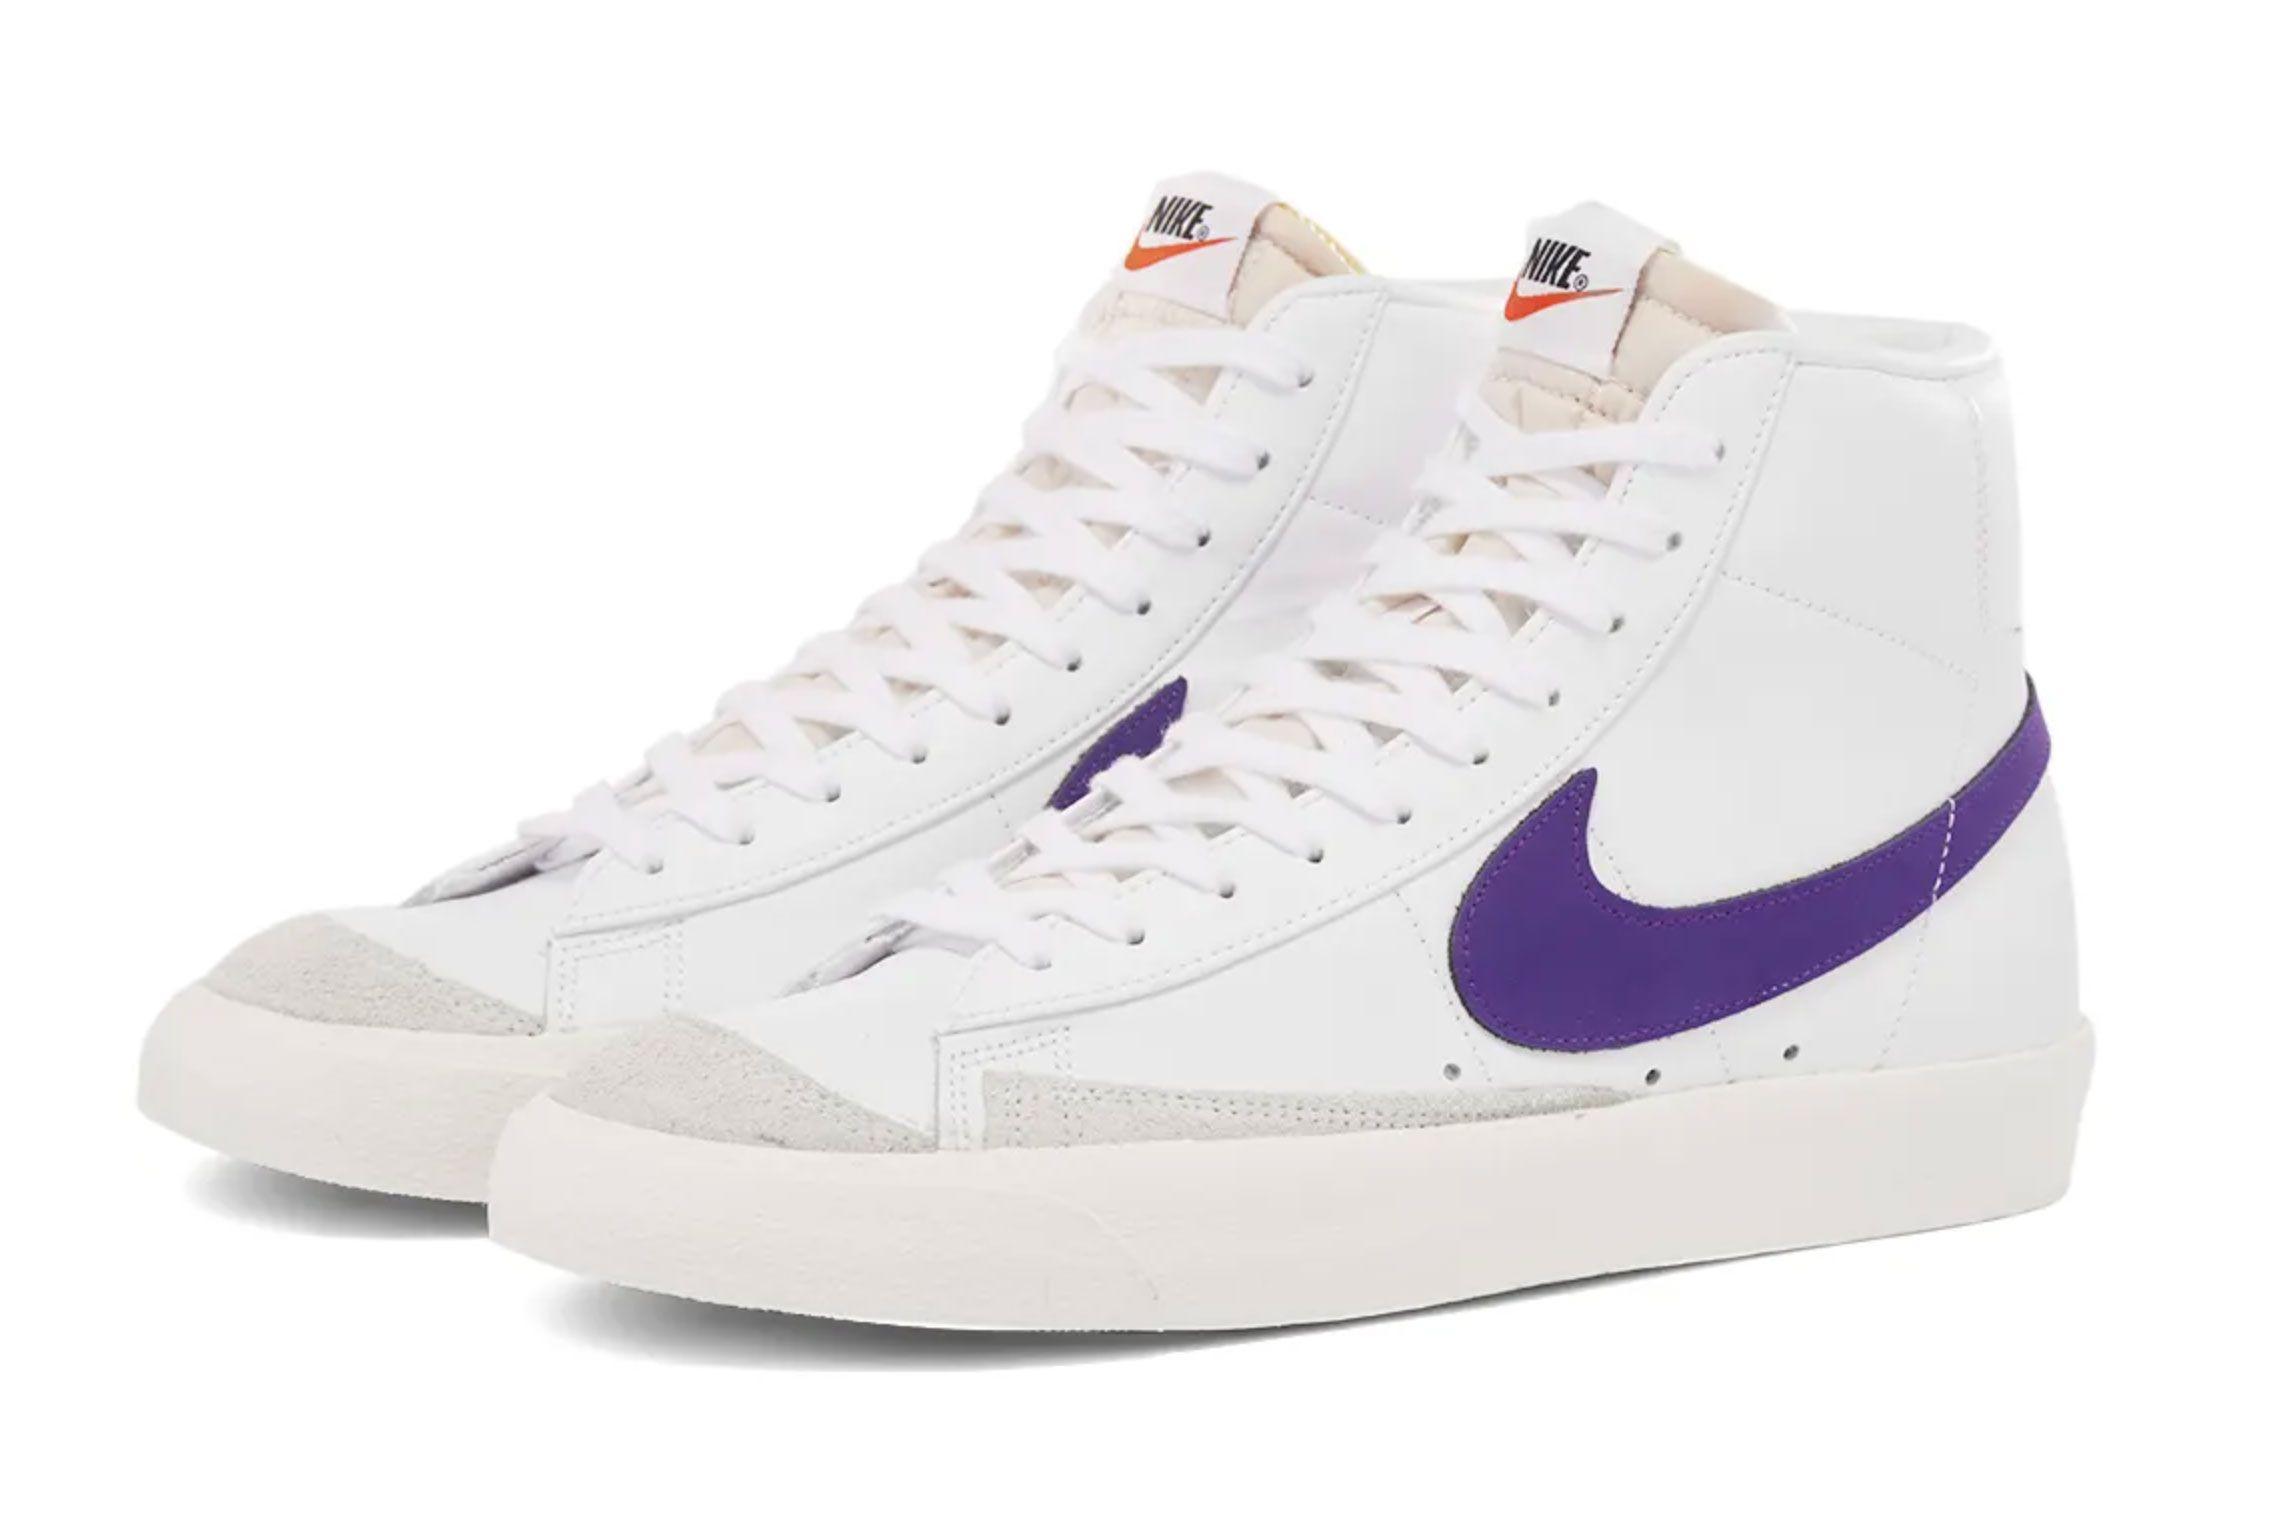 Nike Blazer Mid (Voltage Purple)